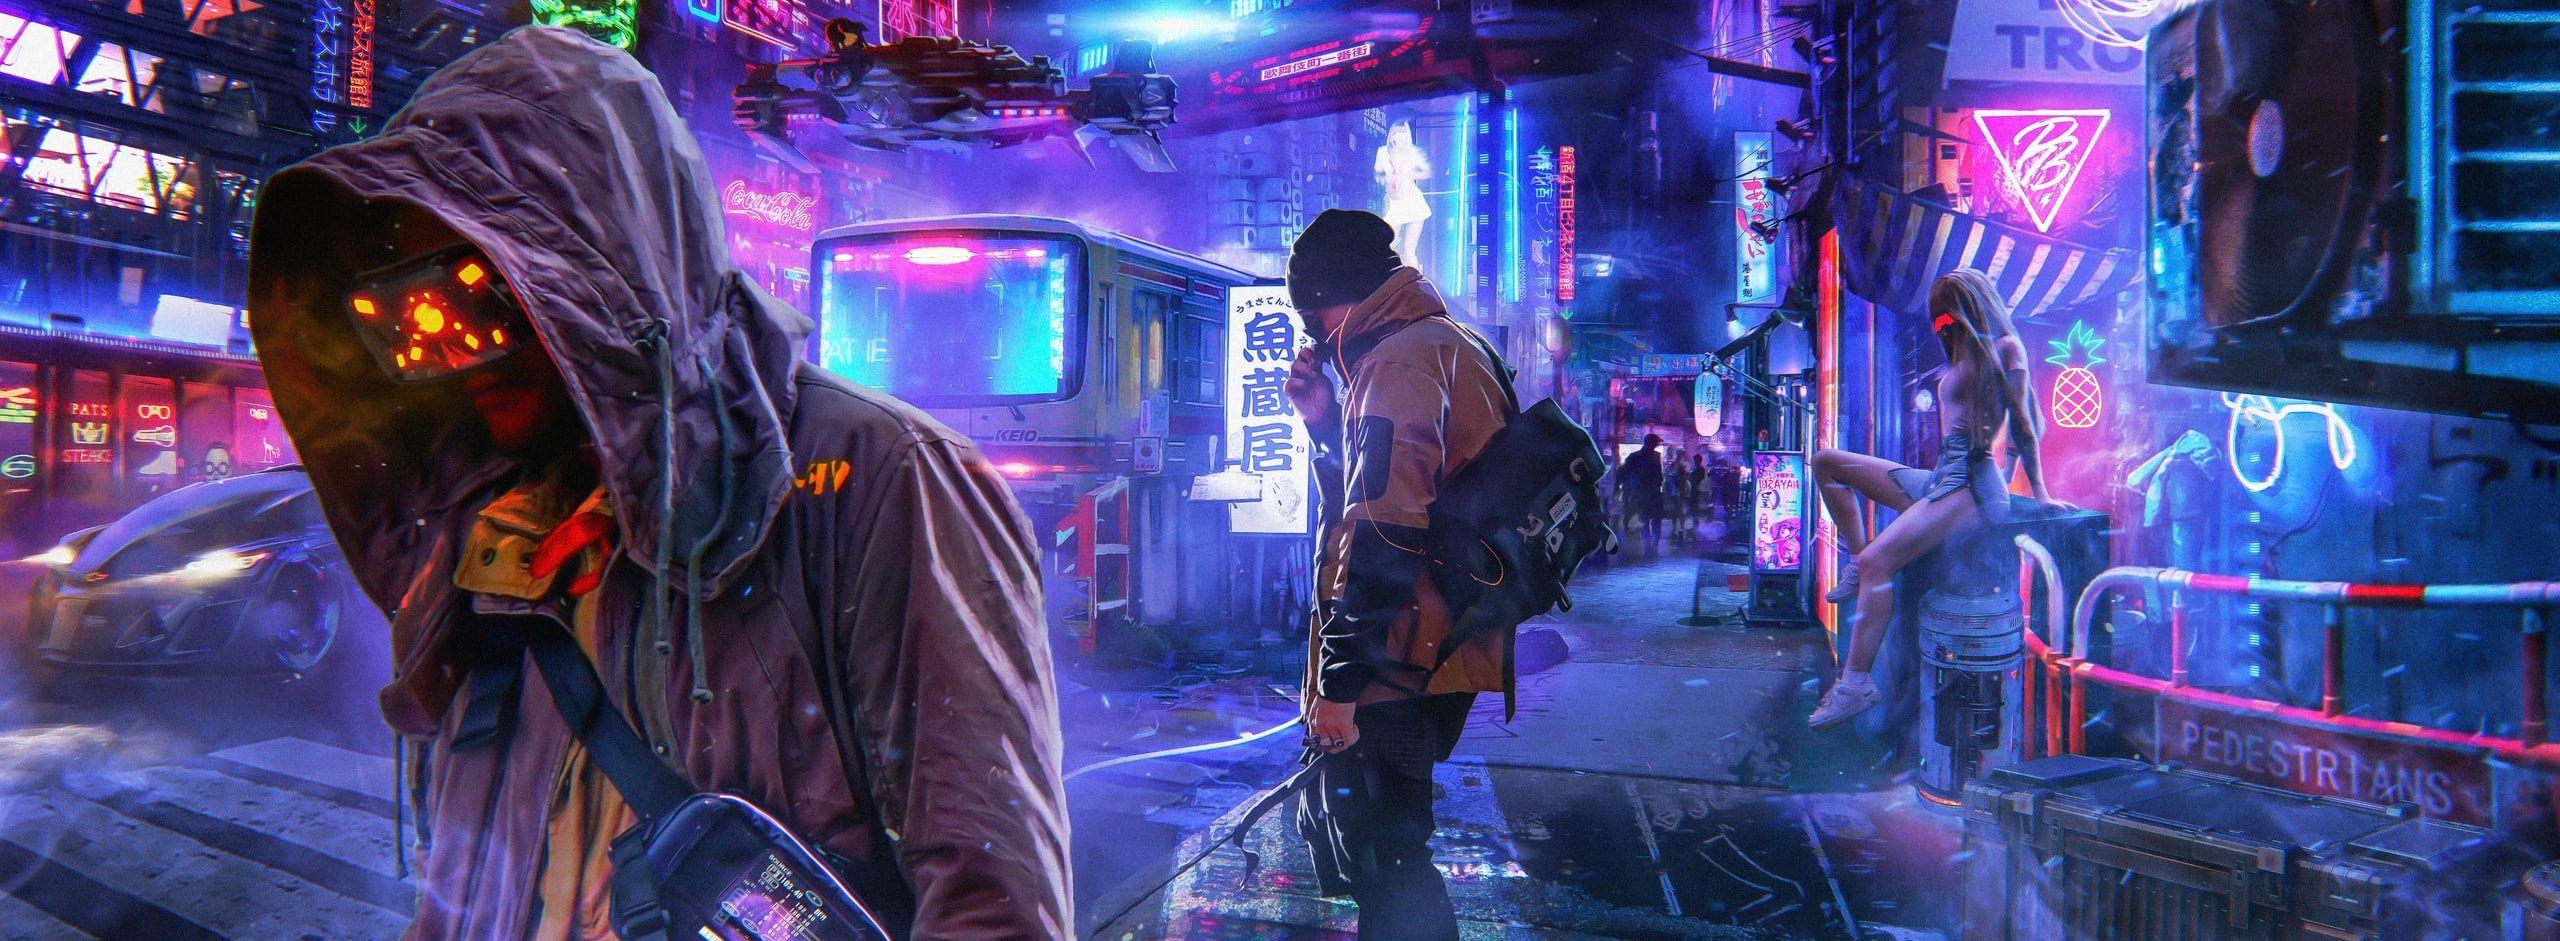 Digital Art Photoshop Concept Art Futuristic Futuristic City Cyberpunk Neon Neon Lights People Pavel Bondaren Futuristic City Cyberpunk City Vaporwave Art